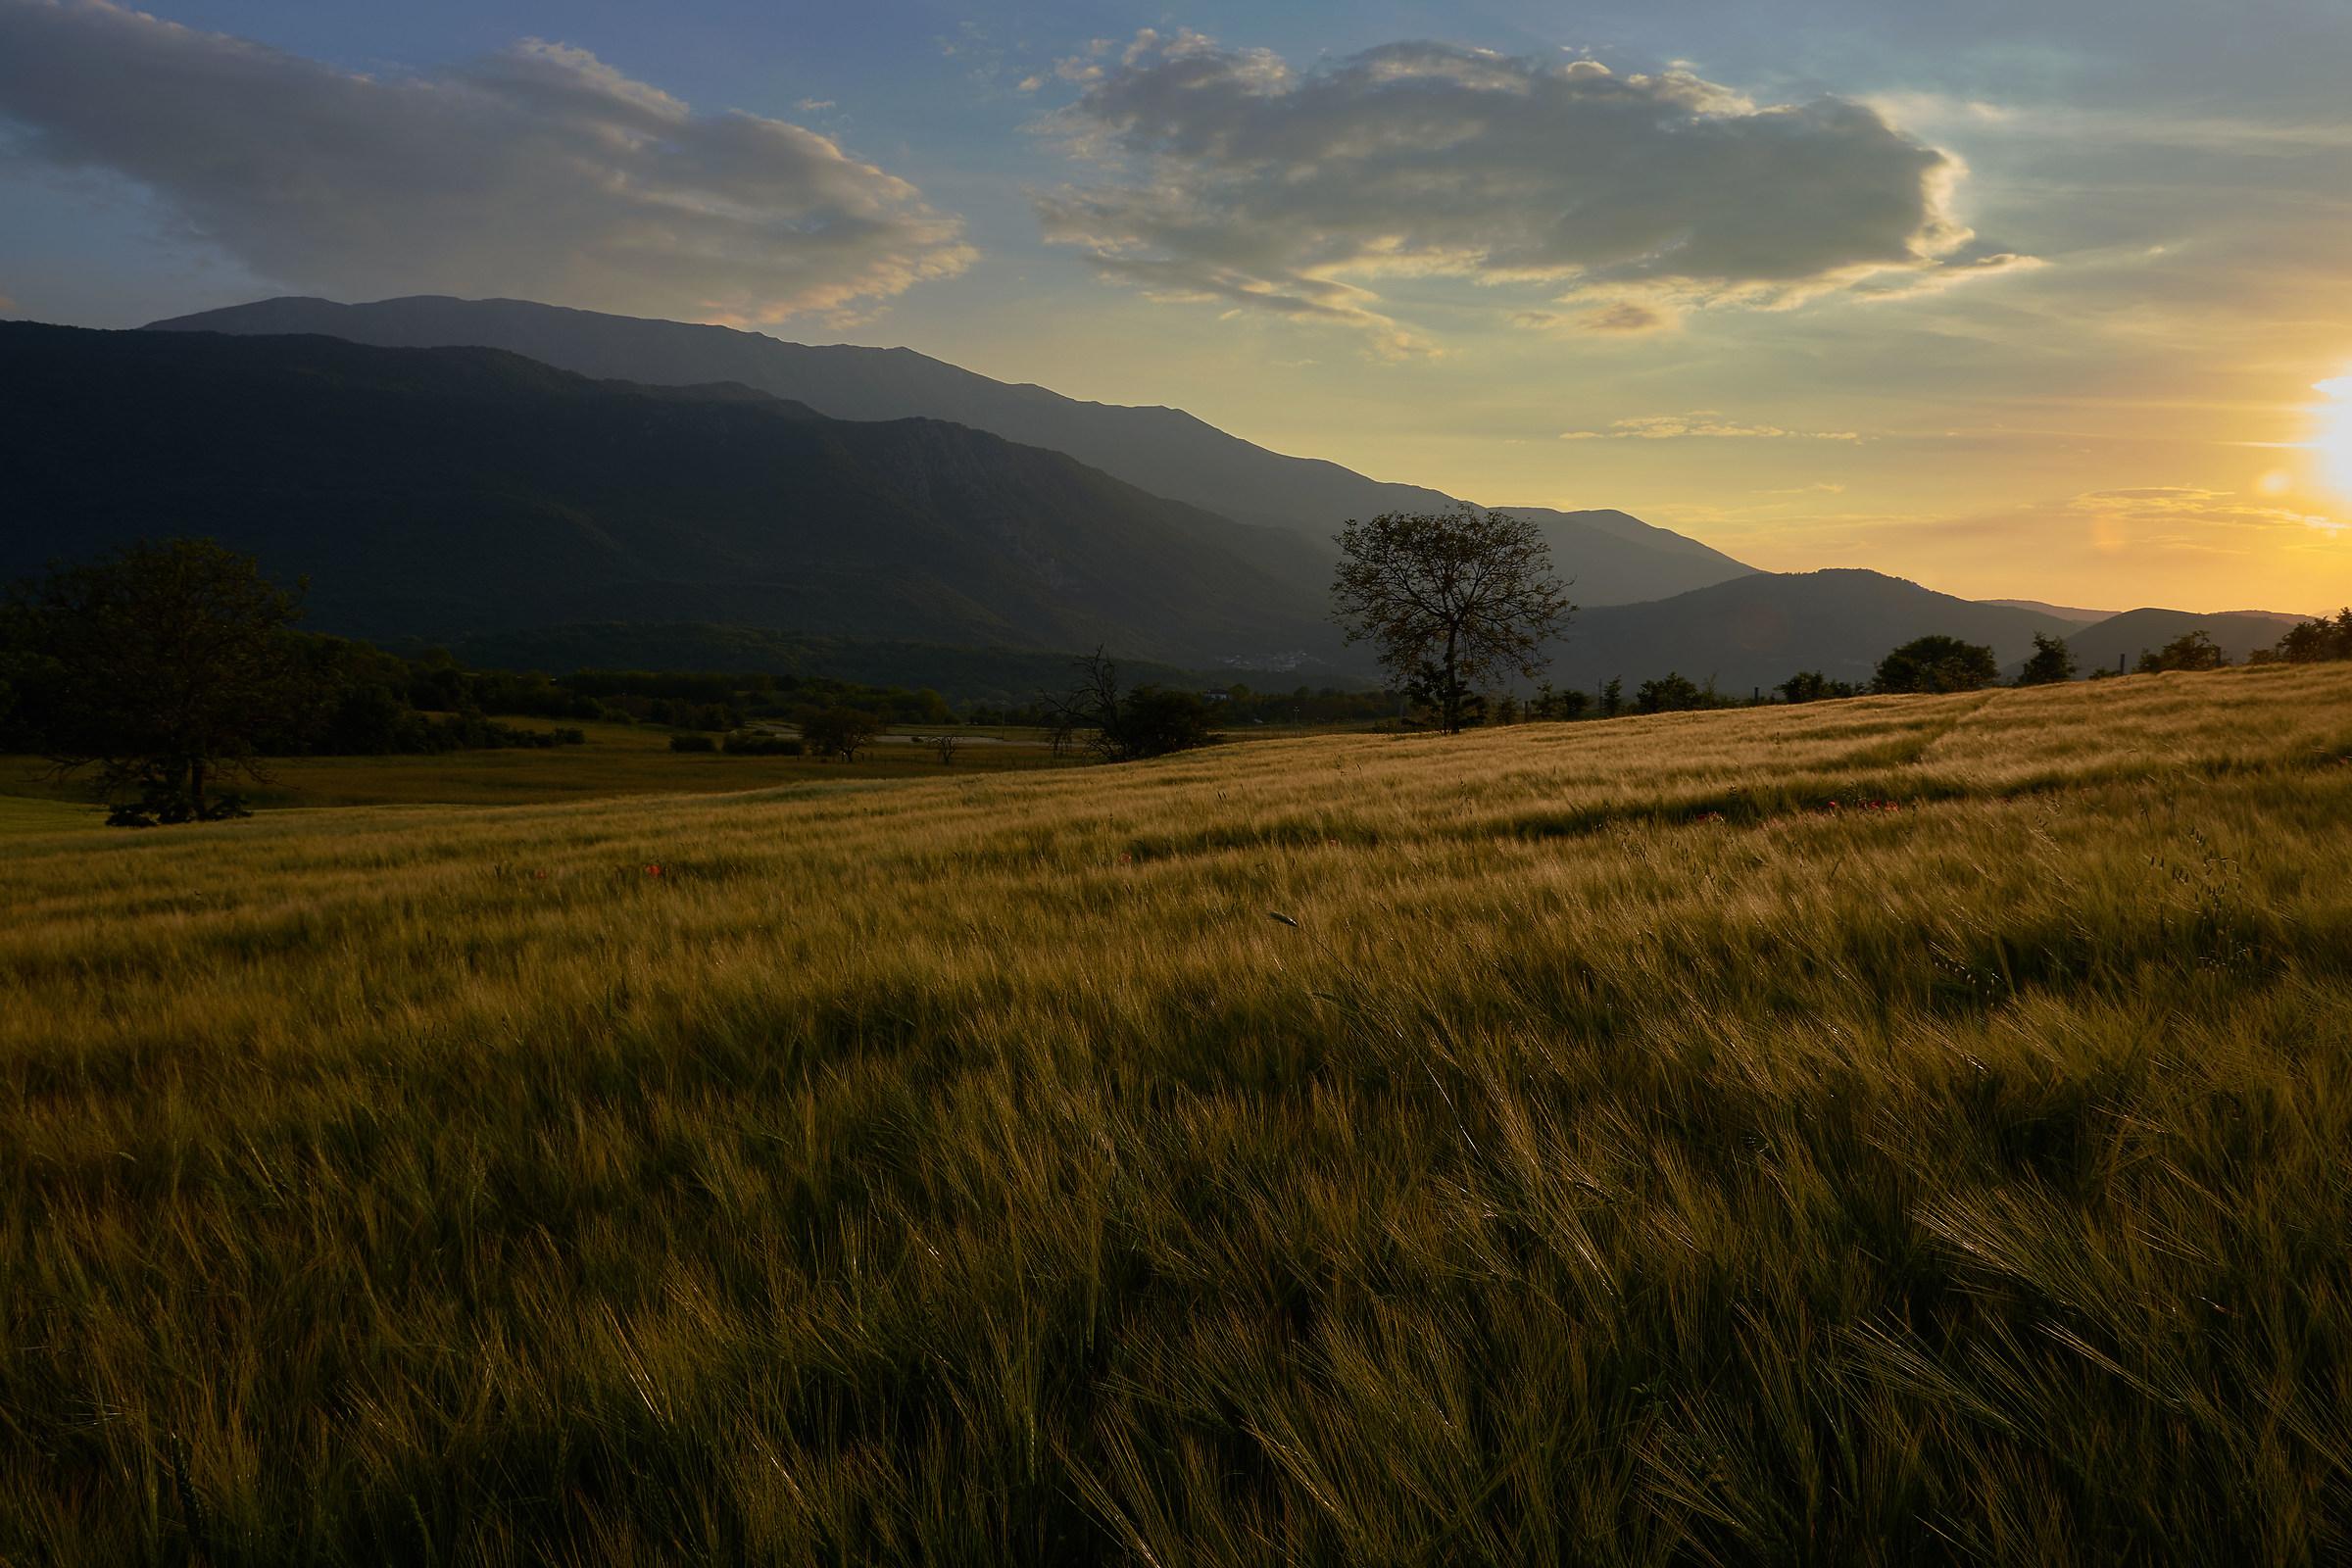 Grain fields at sunset...